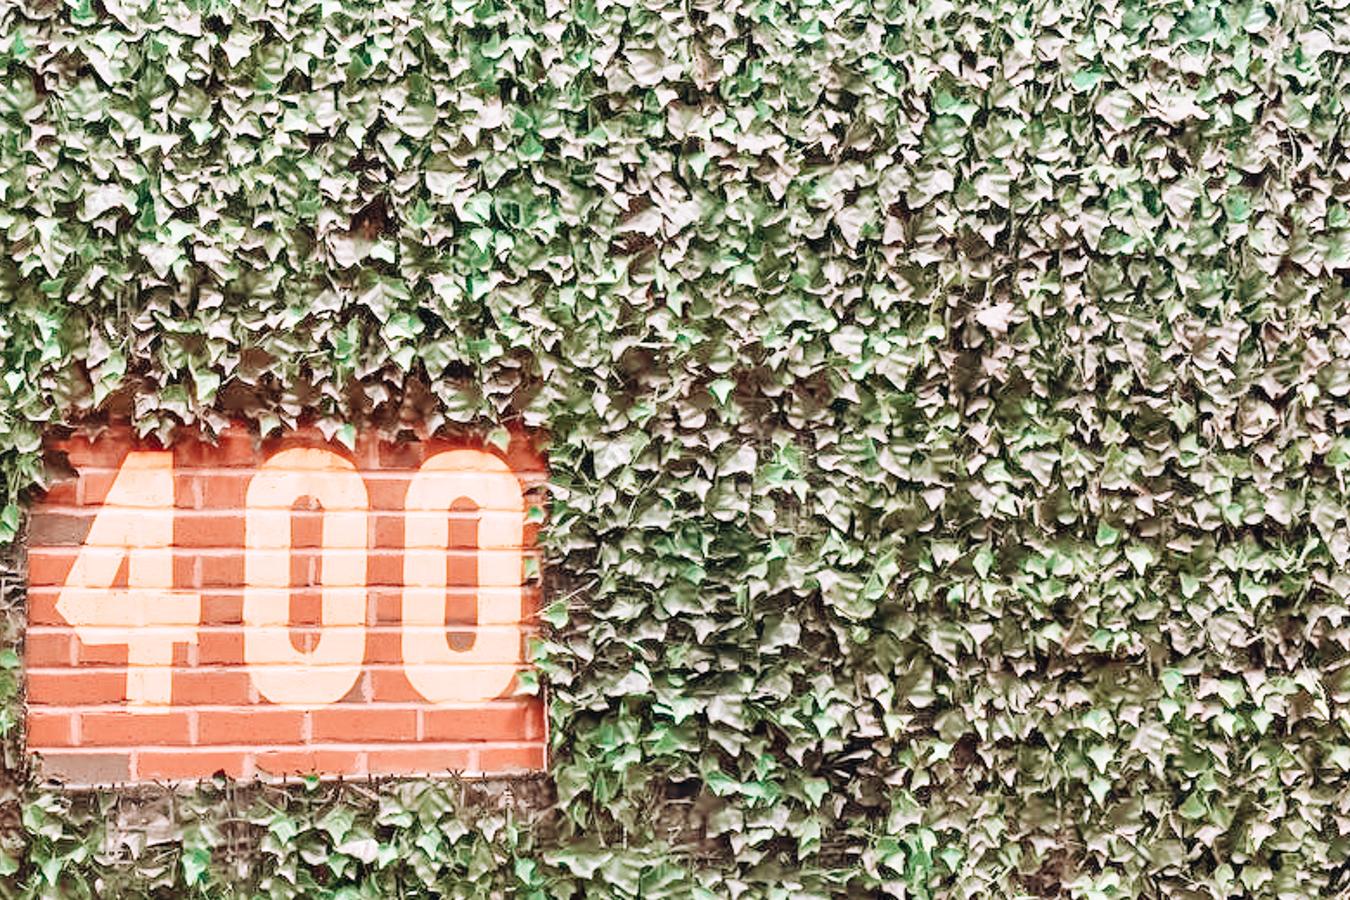 Wall of Wrigley Field